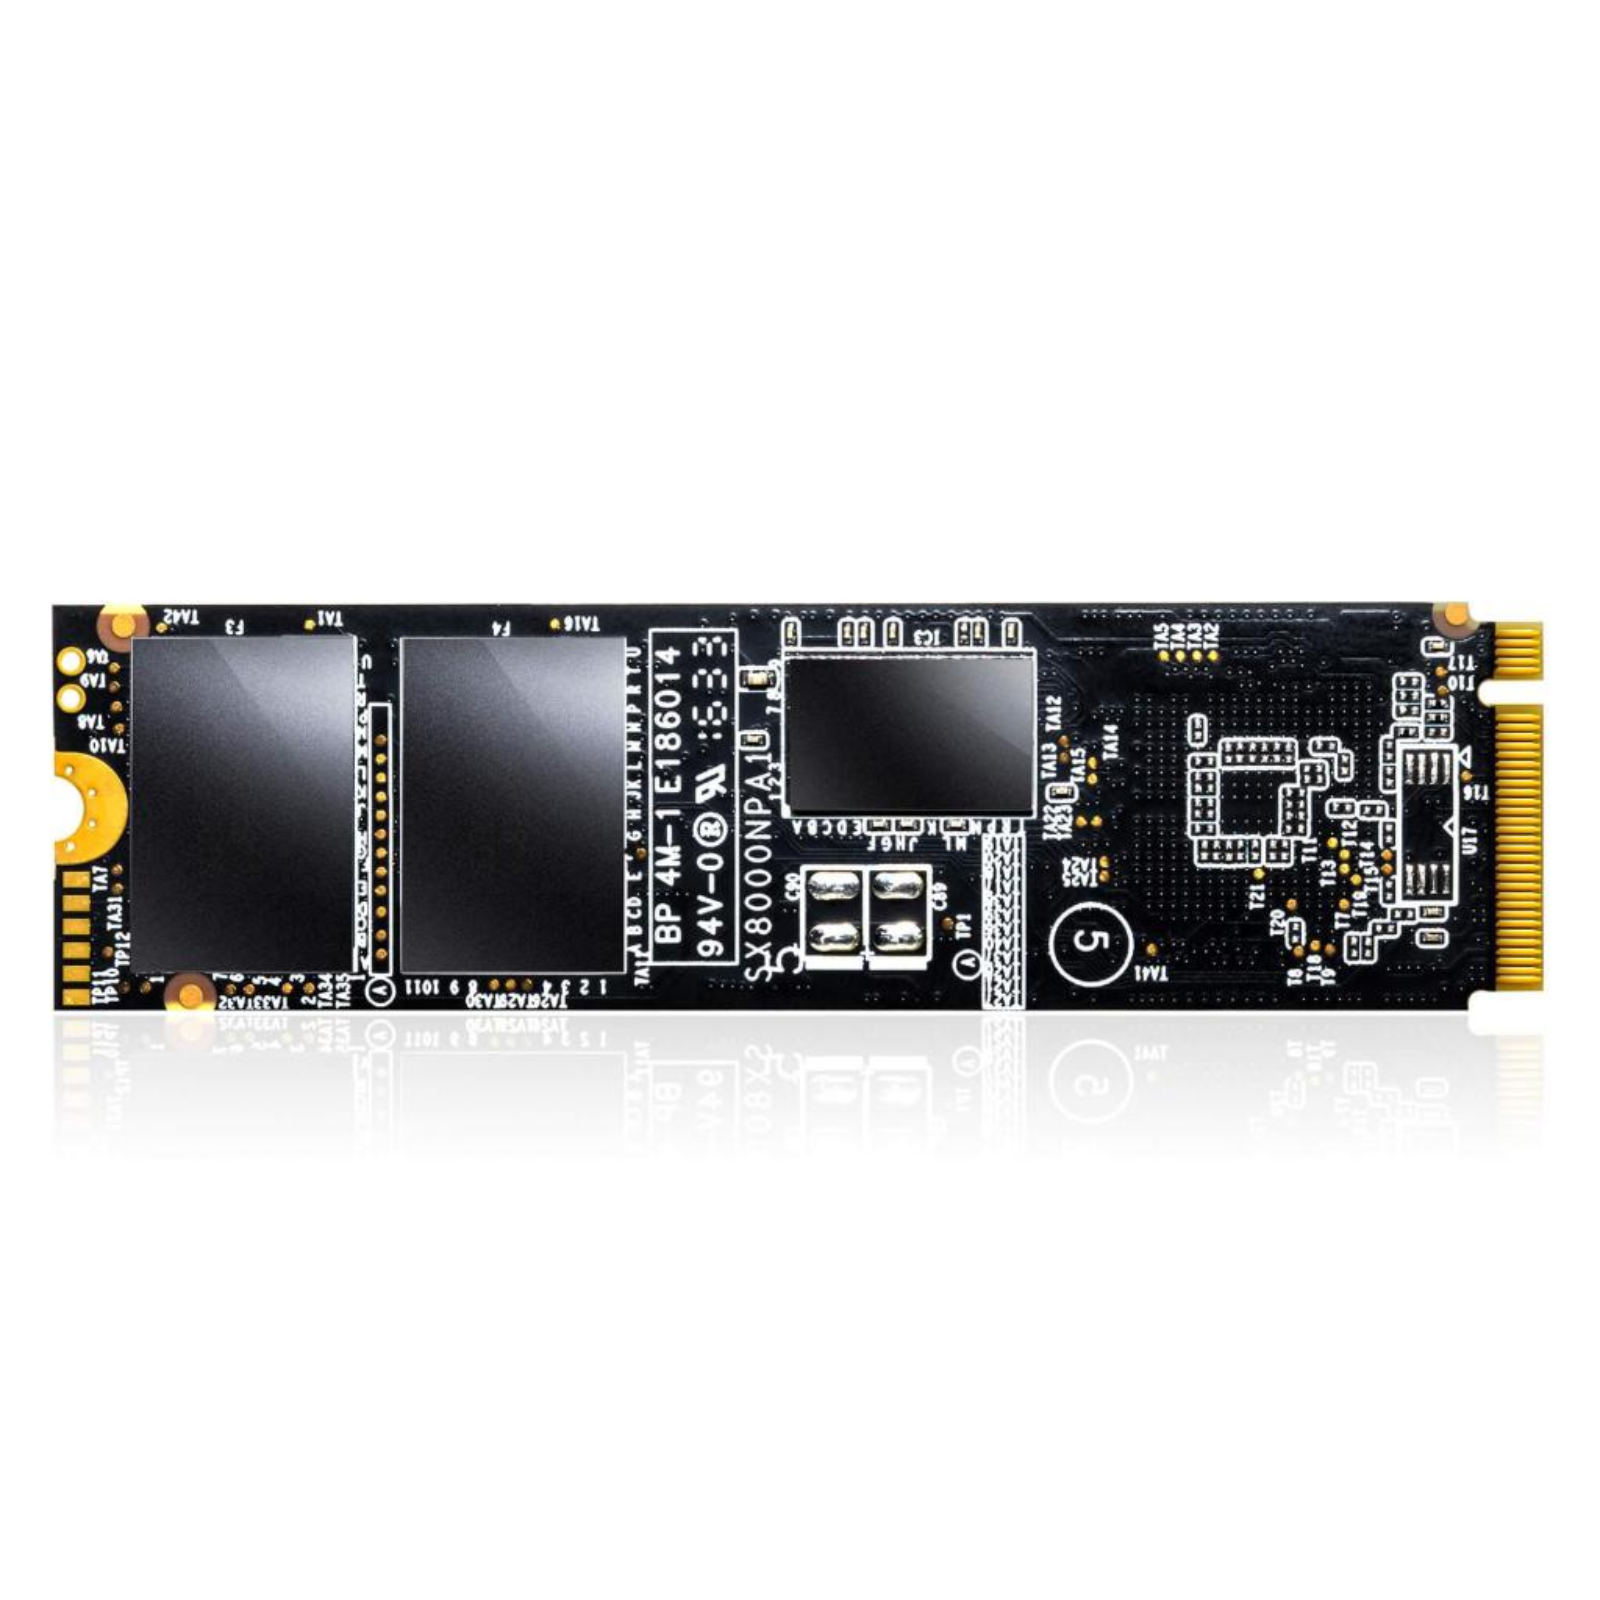 Накопитель SSD M.2 2280 256GB ADATA (ASX7000NPC-256GT-C) изображение 4